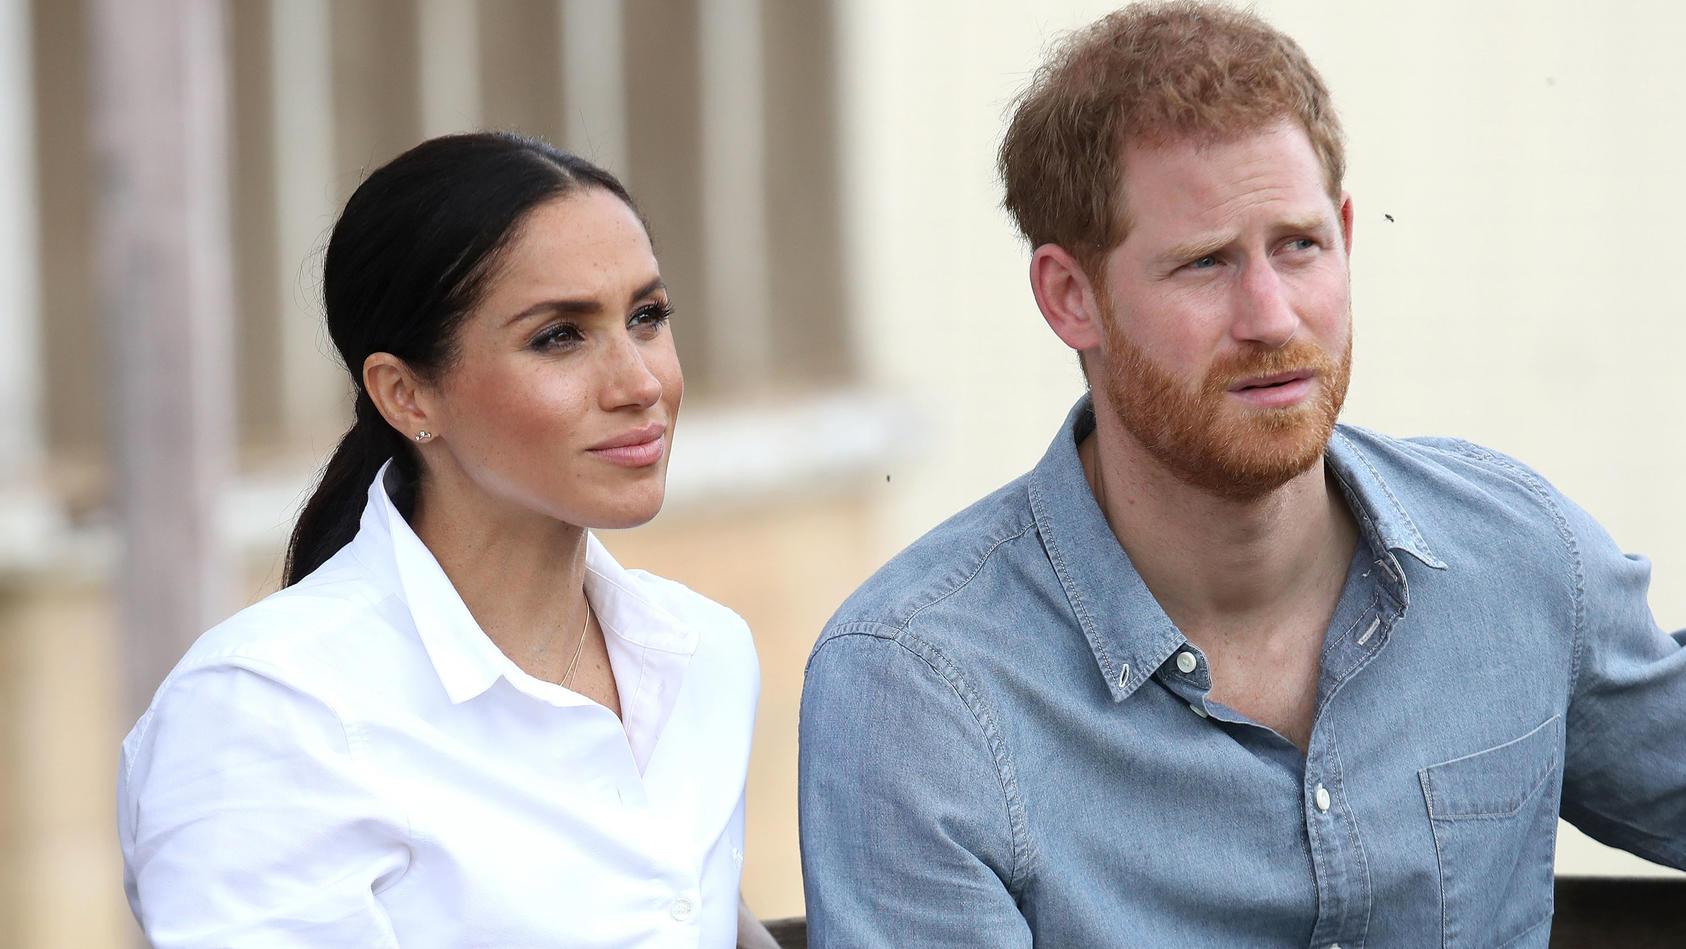 Kritik an Herzogin Meghan und Prinz Harry.